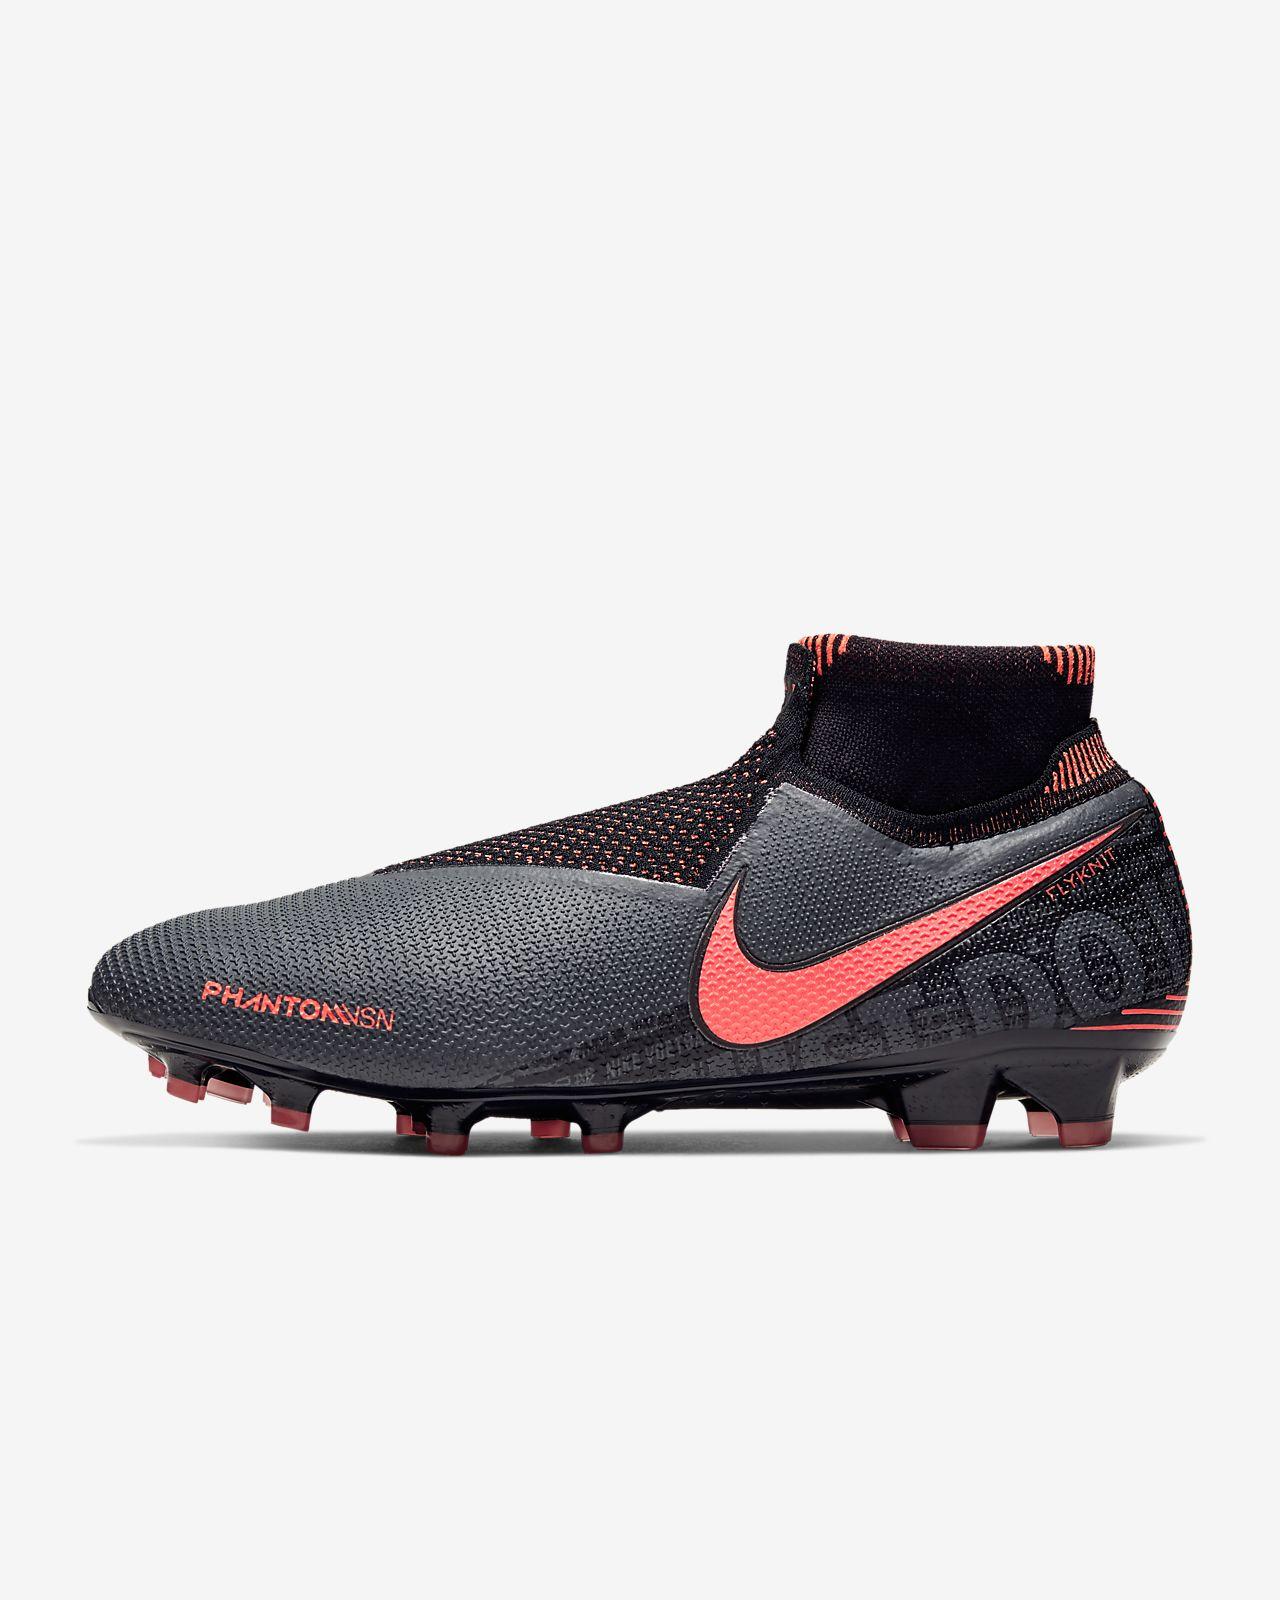 Nike Phantom Vision Elite Dynamic Fit FG Voetbalschoen (stevige ondergrond)